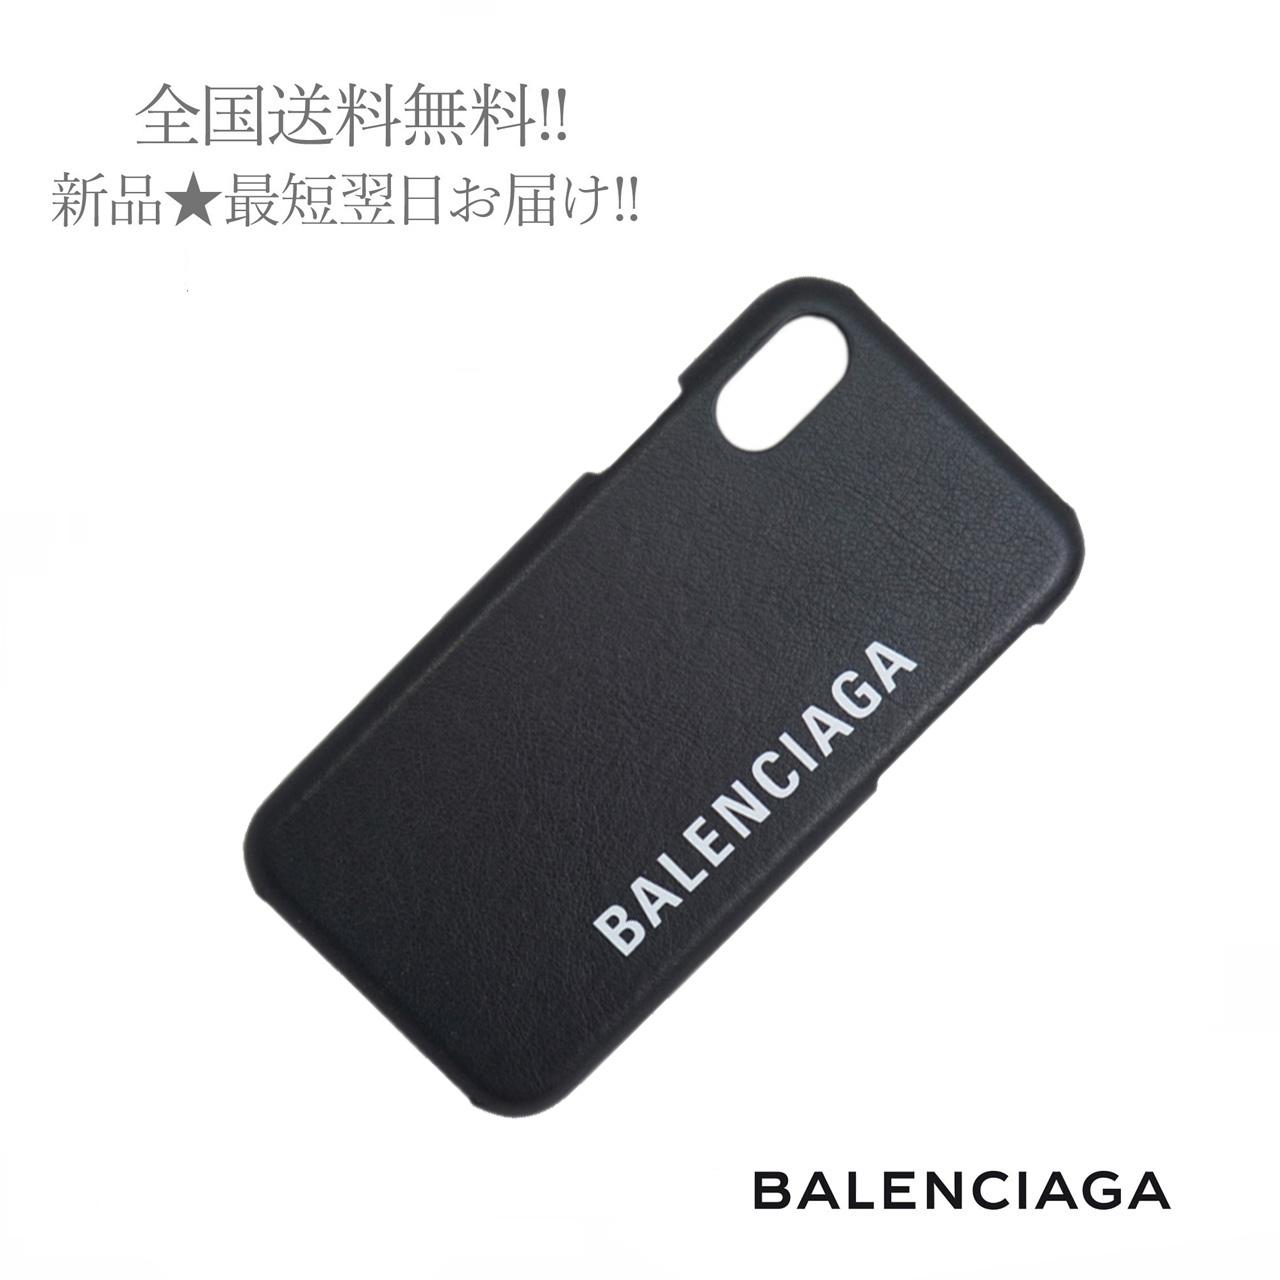 BALENCIAGA 低価格 バレンシアガ ロゴ Iphone 高い素材 X スモアホ ケース アイフォン メンズ ユニセックス レディース兼用 アップル 新品 男 ブラック 女